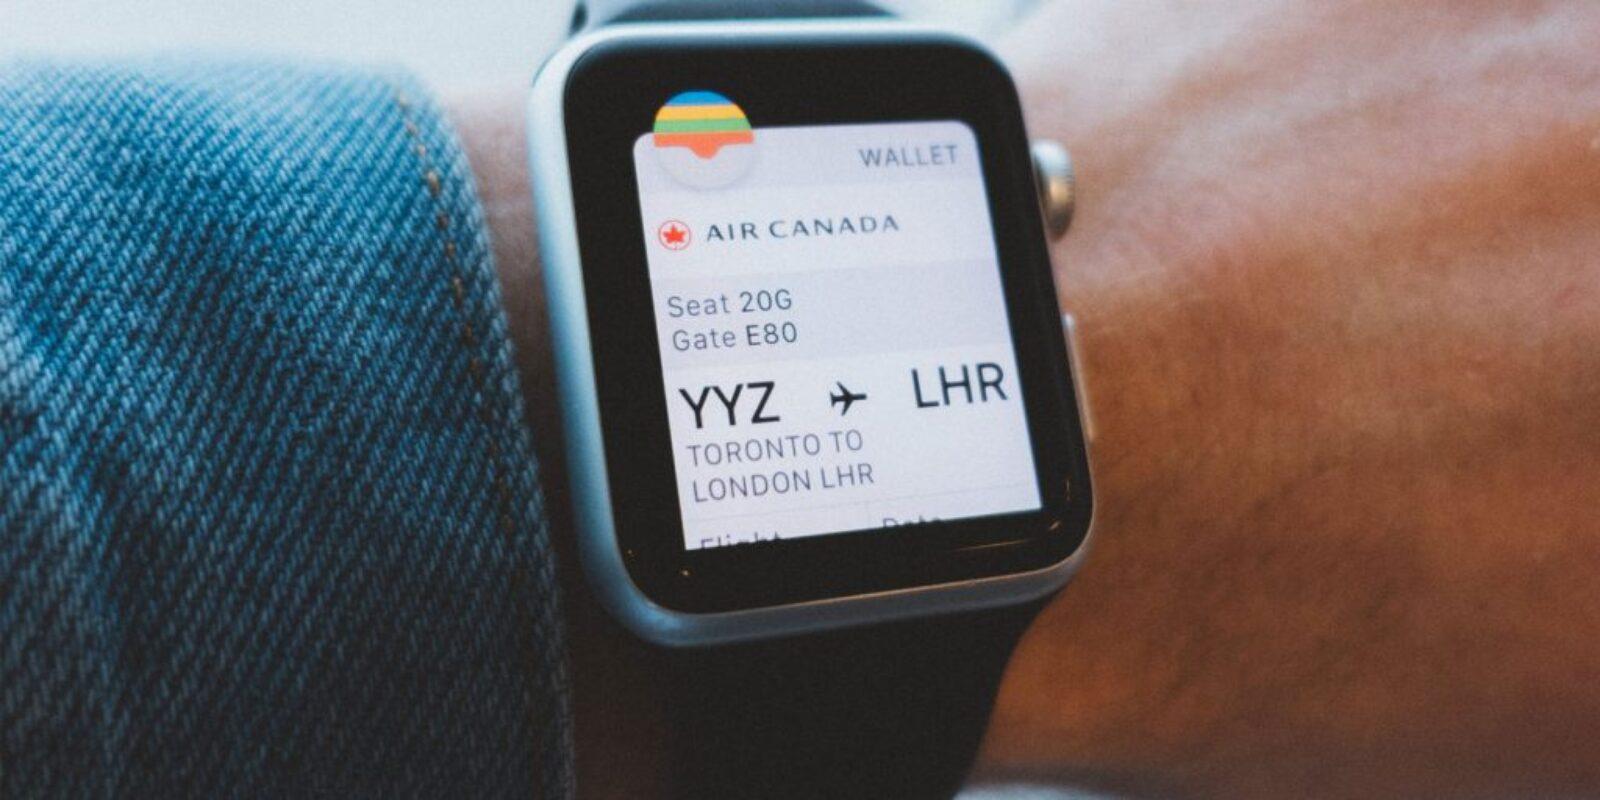 Project: iOS Travel App